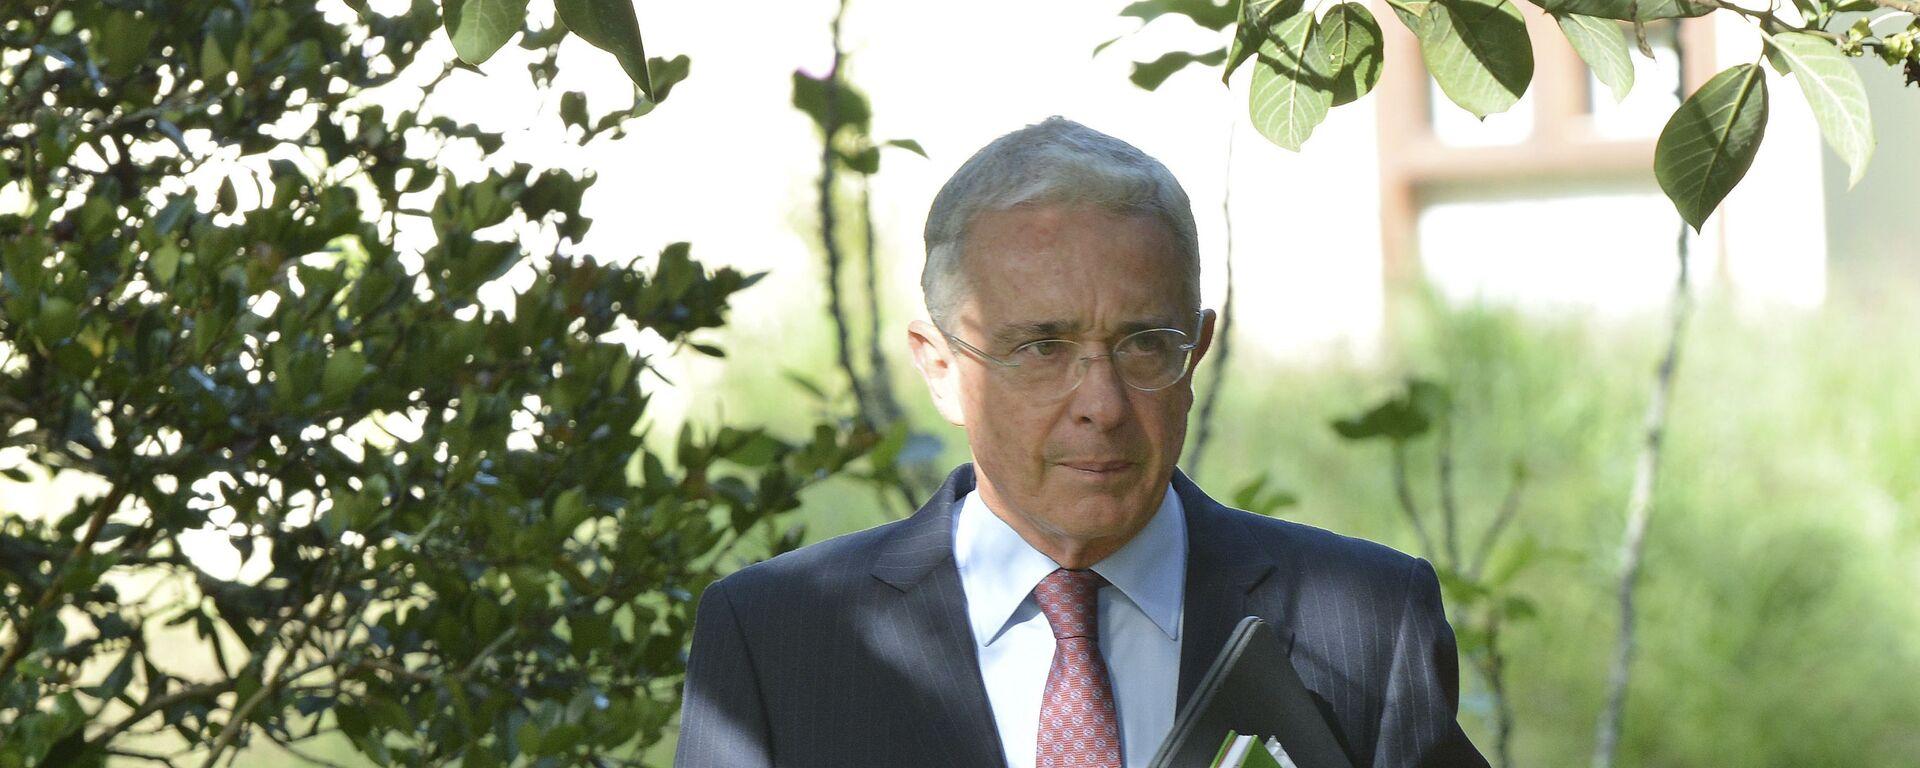 Álvaro Uribe, expresidente de Colombia - Sputnik Mundo, 1920, 24.05.2021